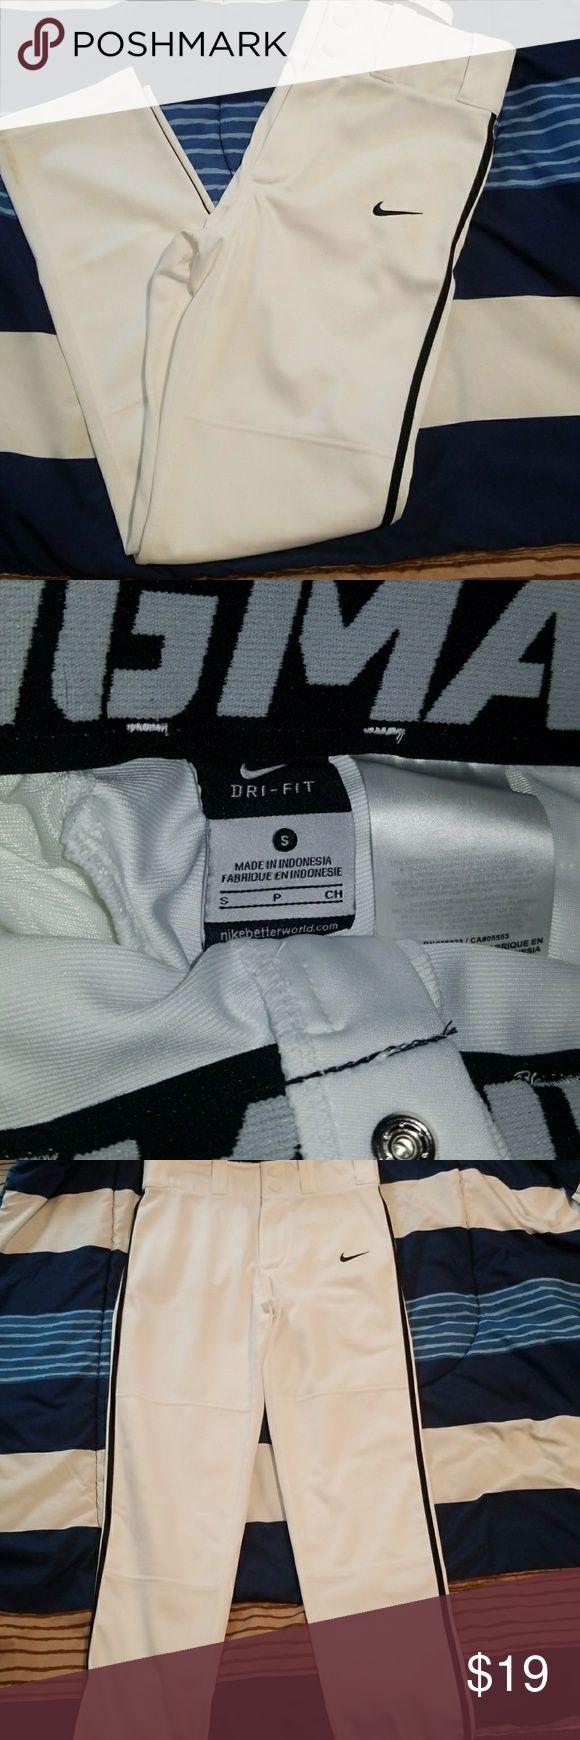 Nike baseball pant Boys white and black baseball pant. Size small. Nike Other